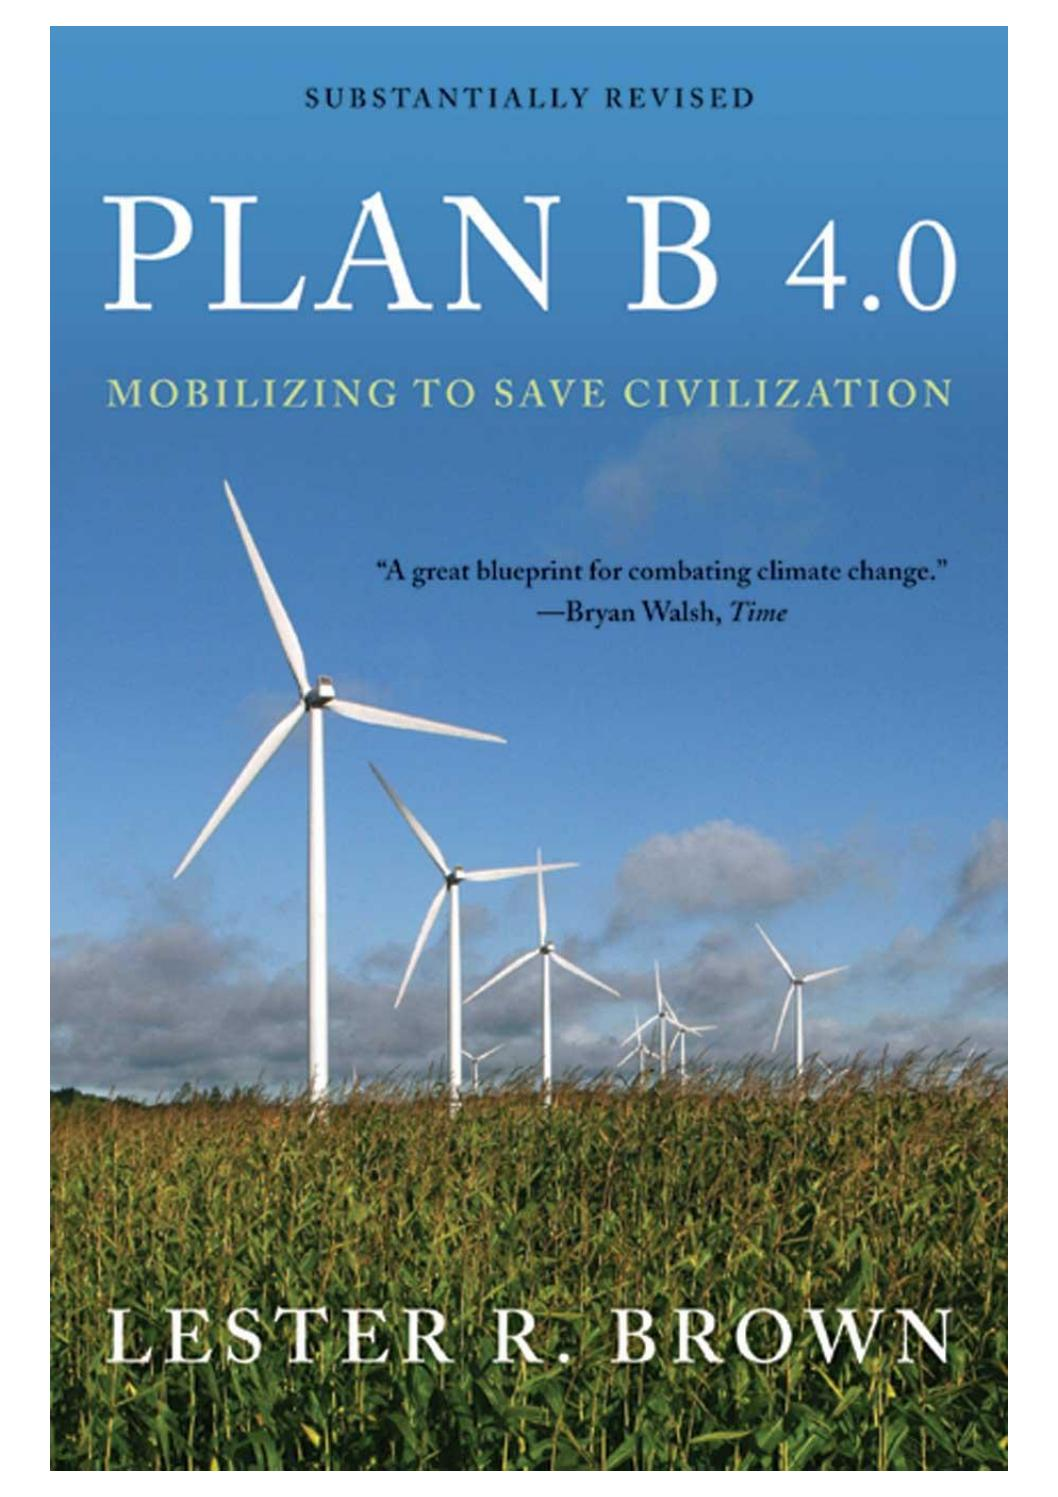 Plan B 4 0 Lester Brown by Liber Libris - issuu